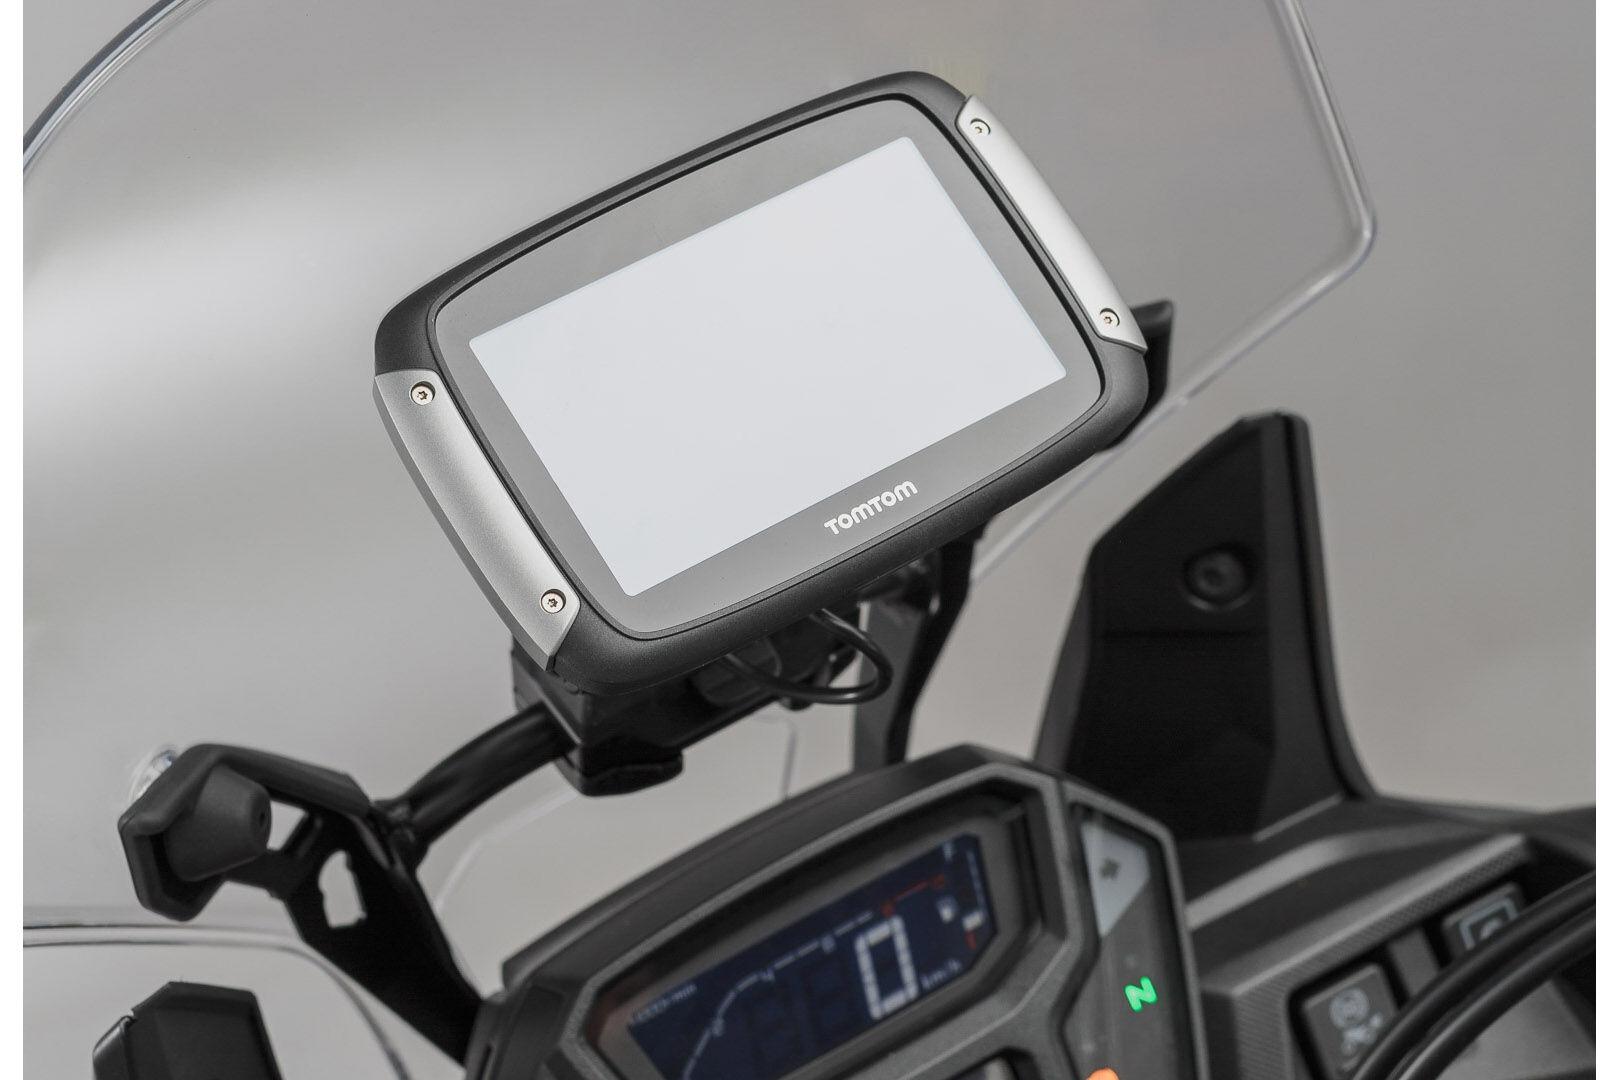 SW-Motech Supporto GPS per traversa Ø 10/12 mm nero